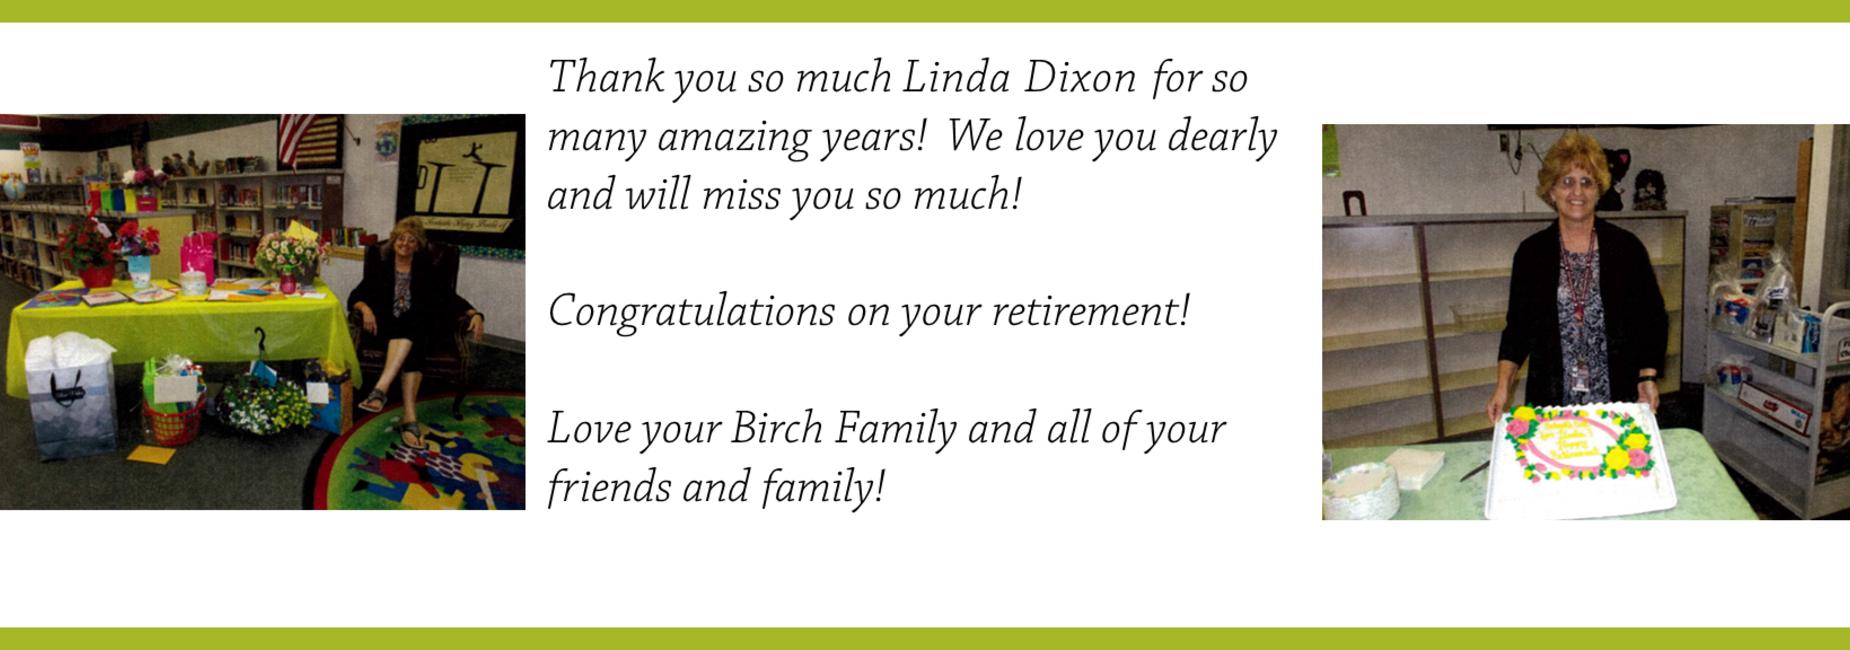 Linda Dixon Retirement